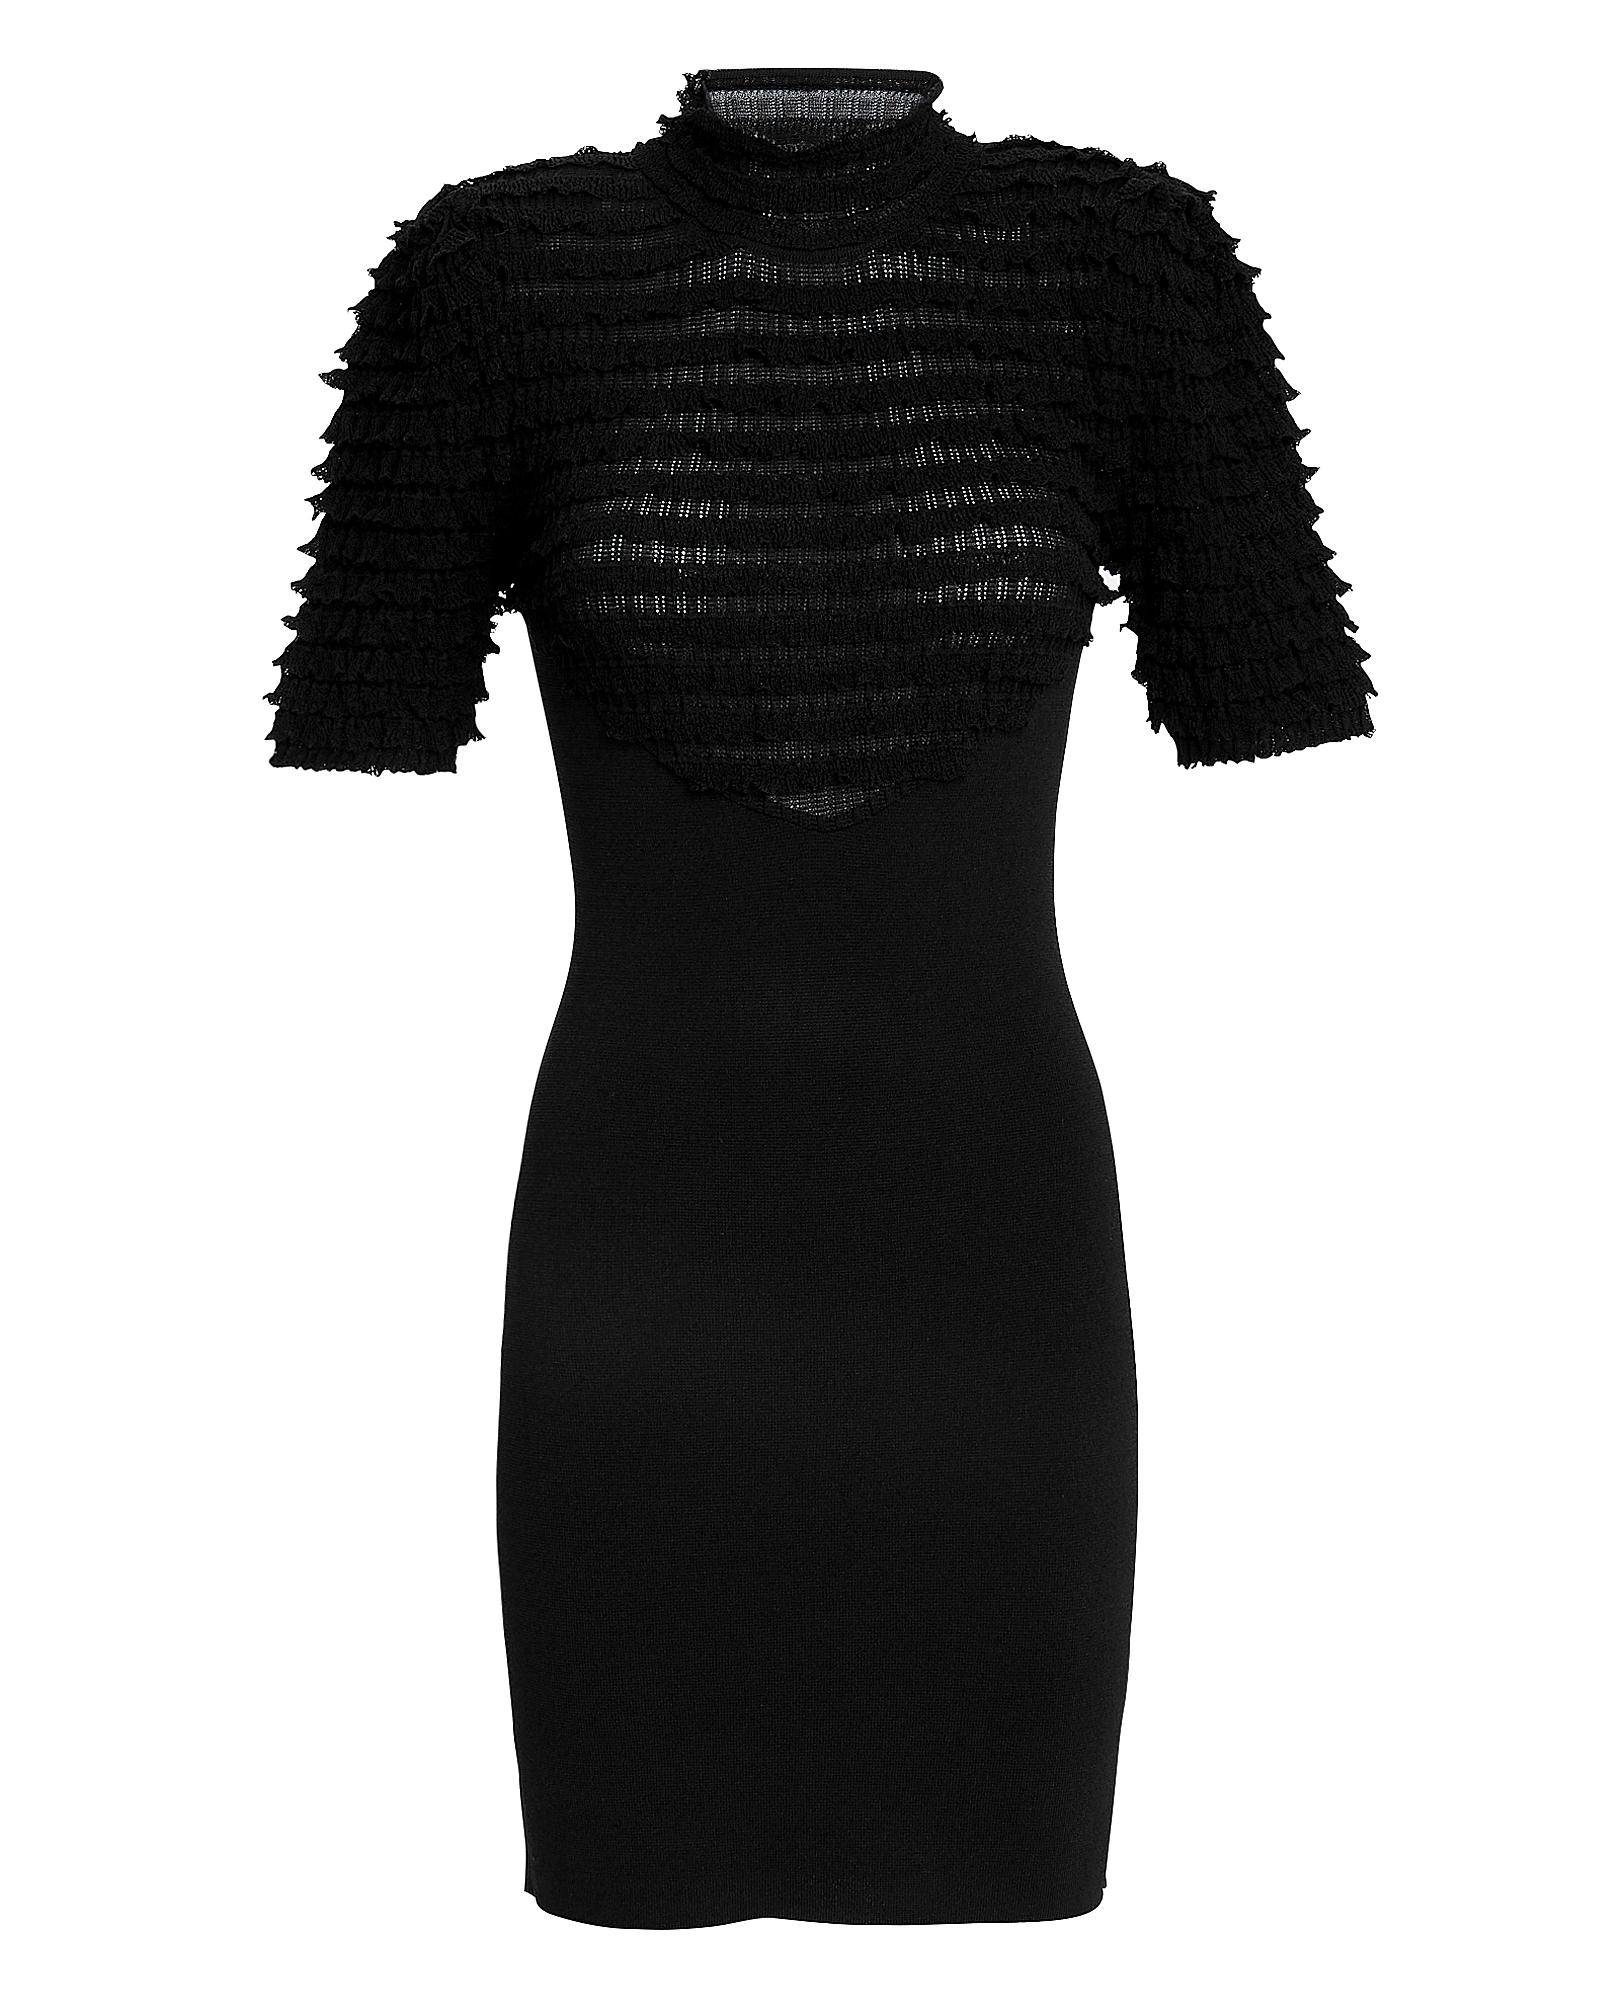 TORN Ronny Kobo Dassah Ini Dress Black